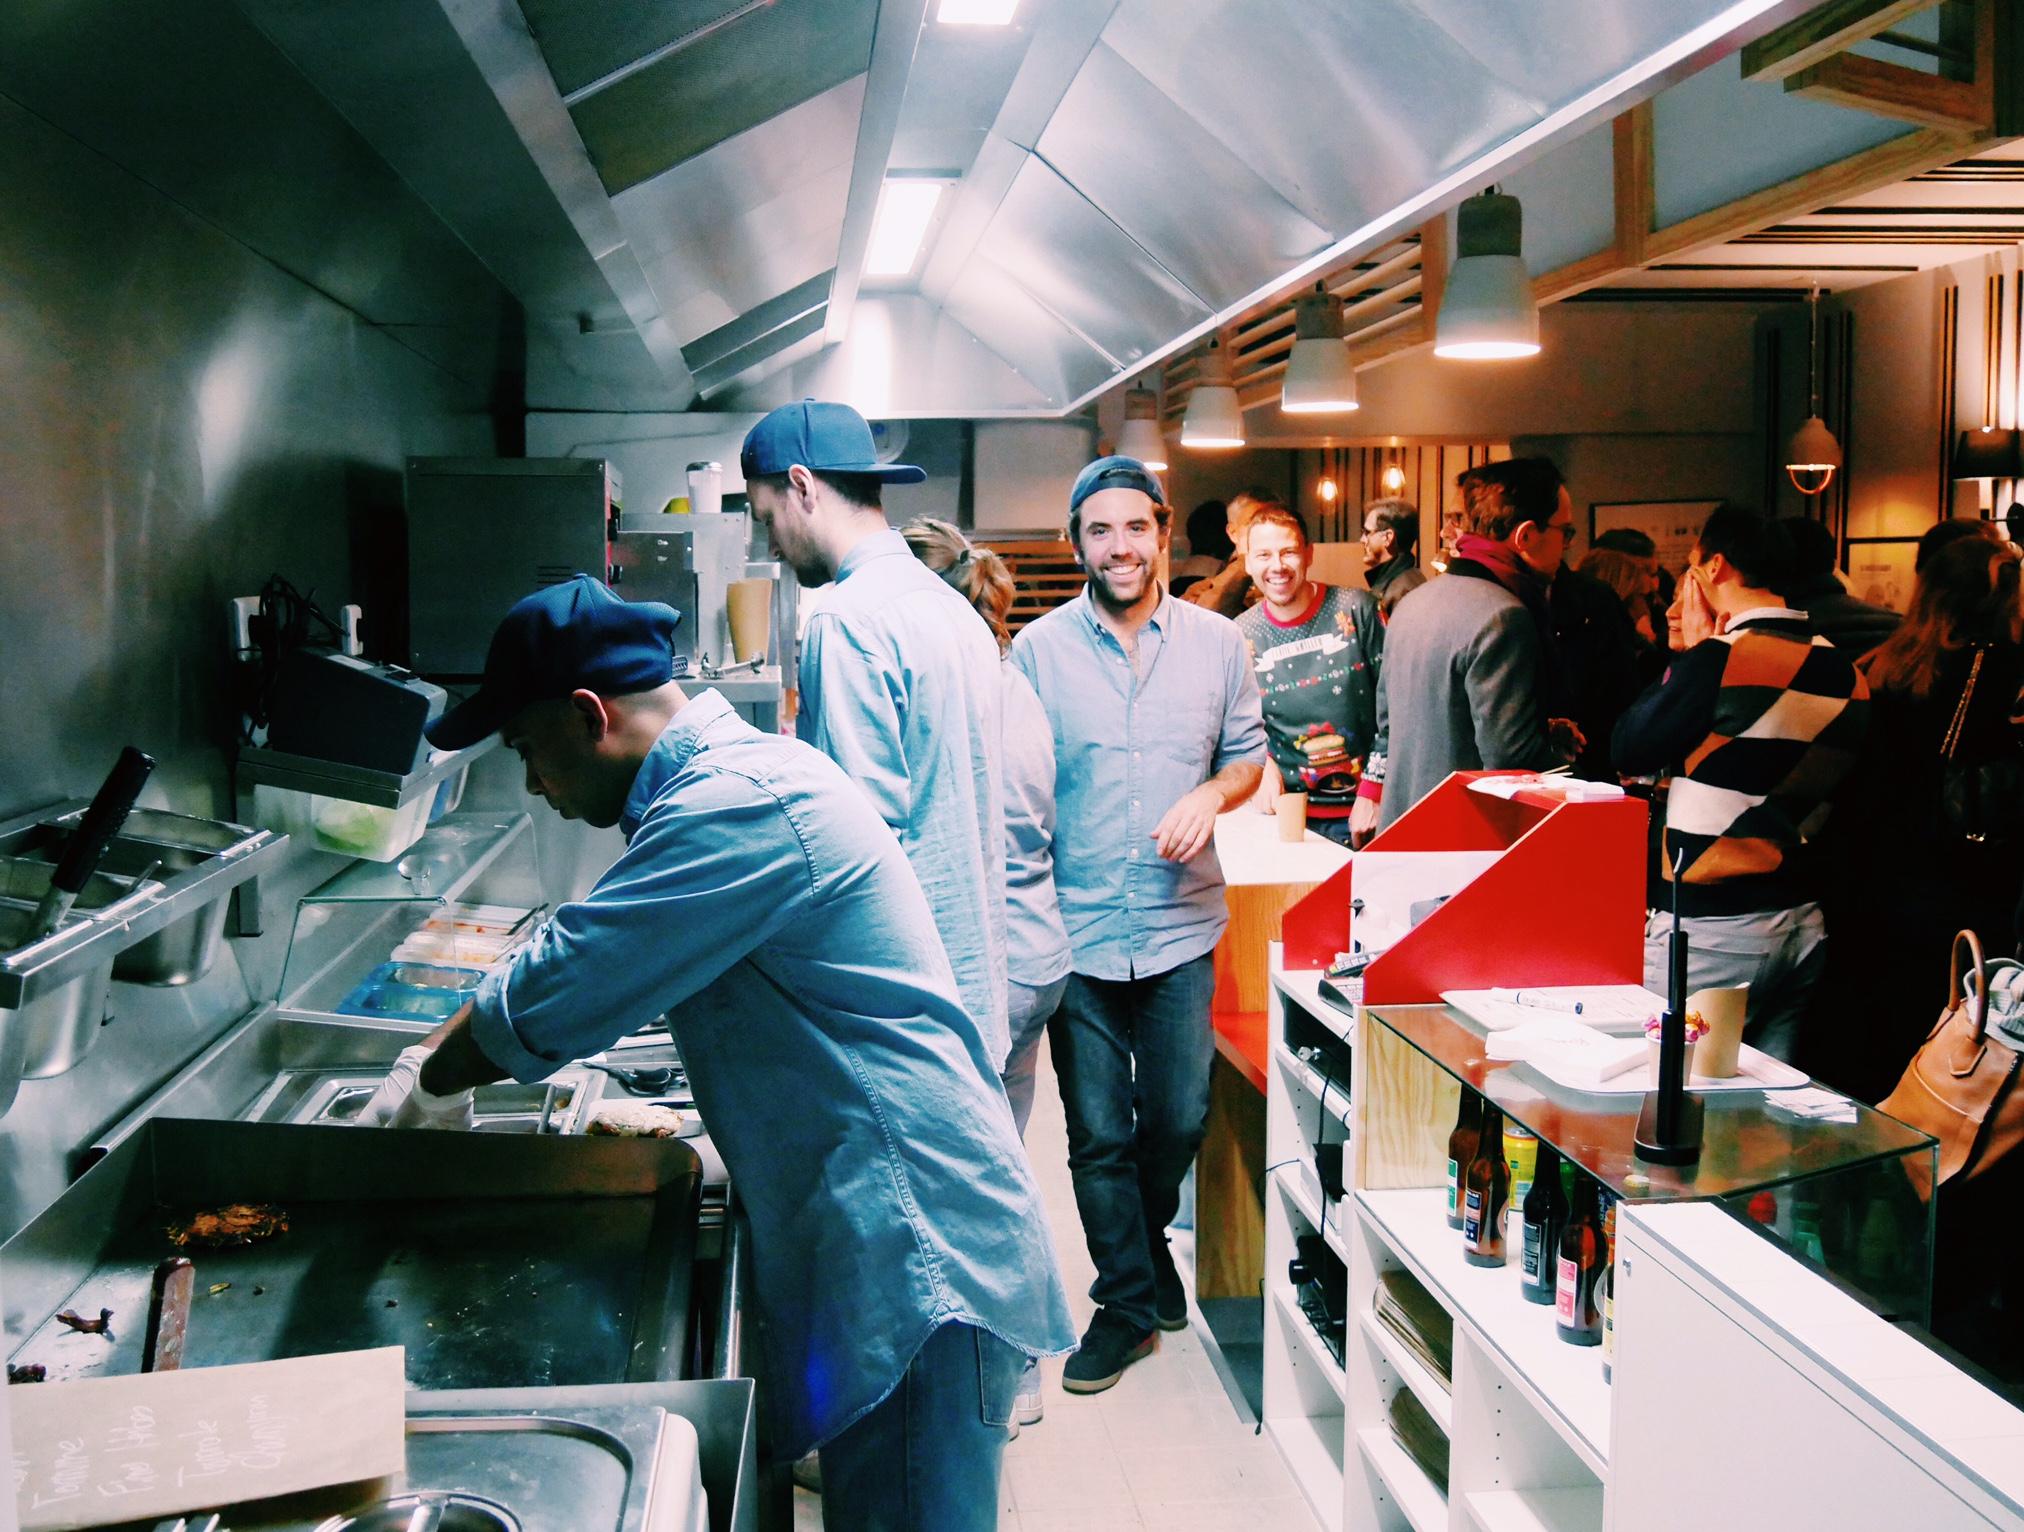 Roomies-burger-cuisine-nouvelle-adresse-restaurant-avenue-percier-paris-mirosmenil-photo-usofparis-blog